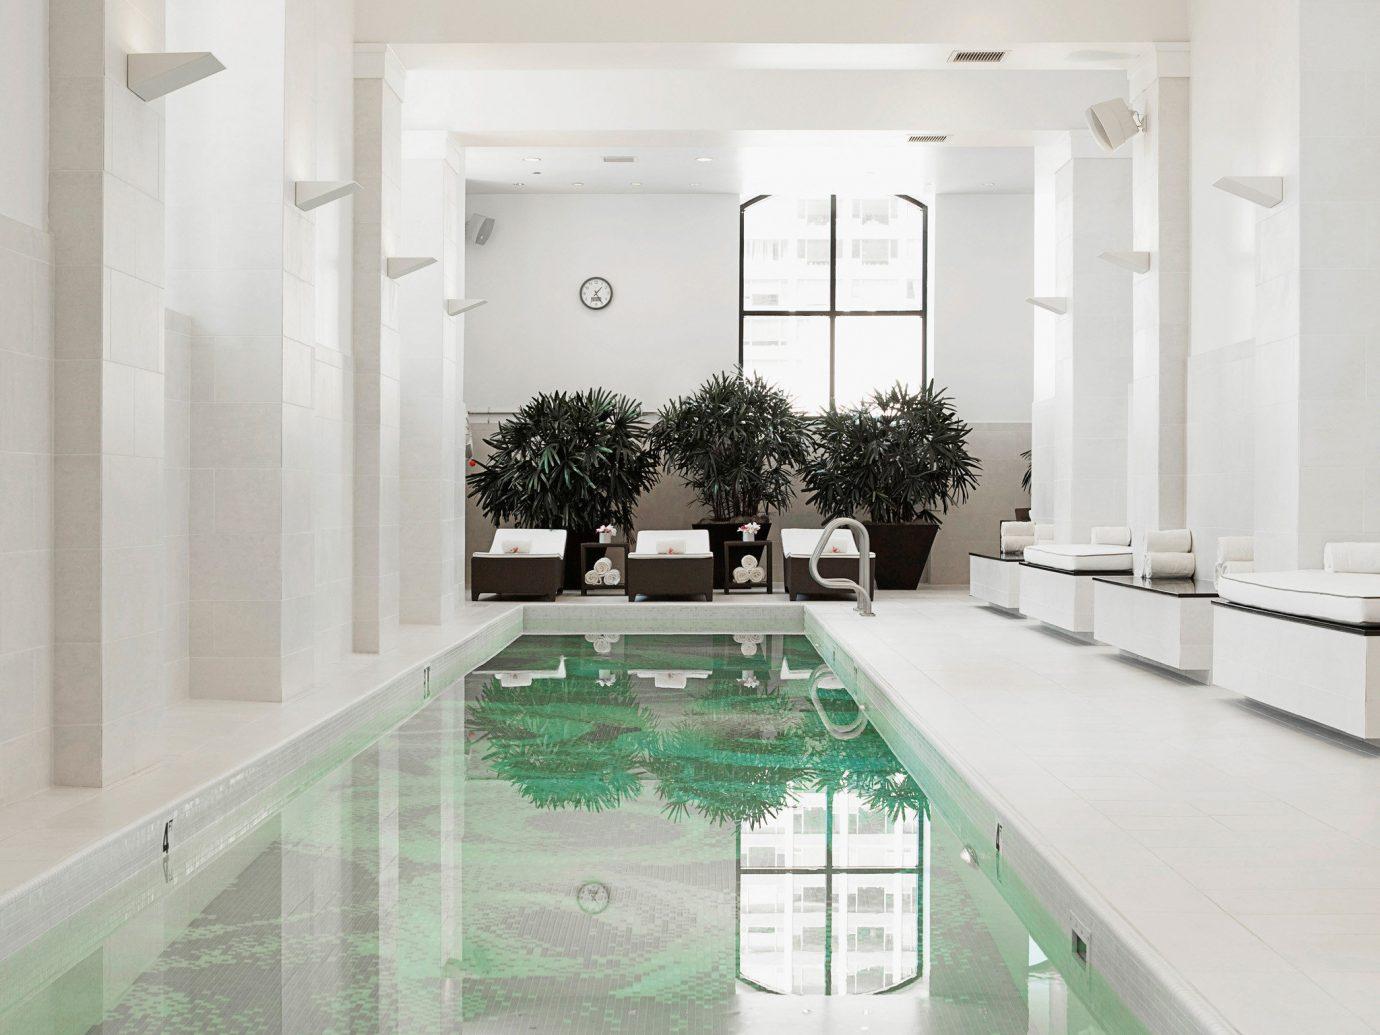 Hotels floor property room indoor swimming pool bathtub interior design estate home flooring daylighting Design living room bathroom mansion area furniture